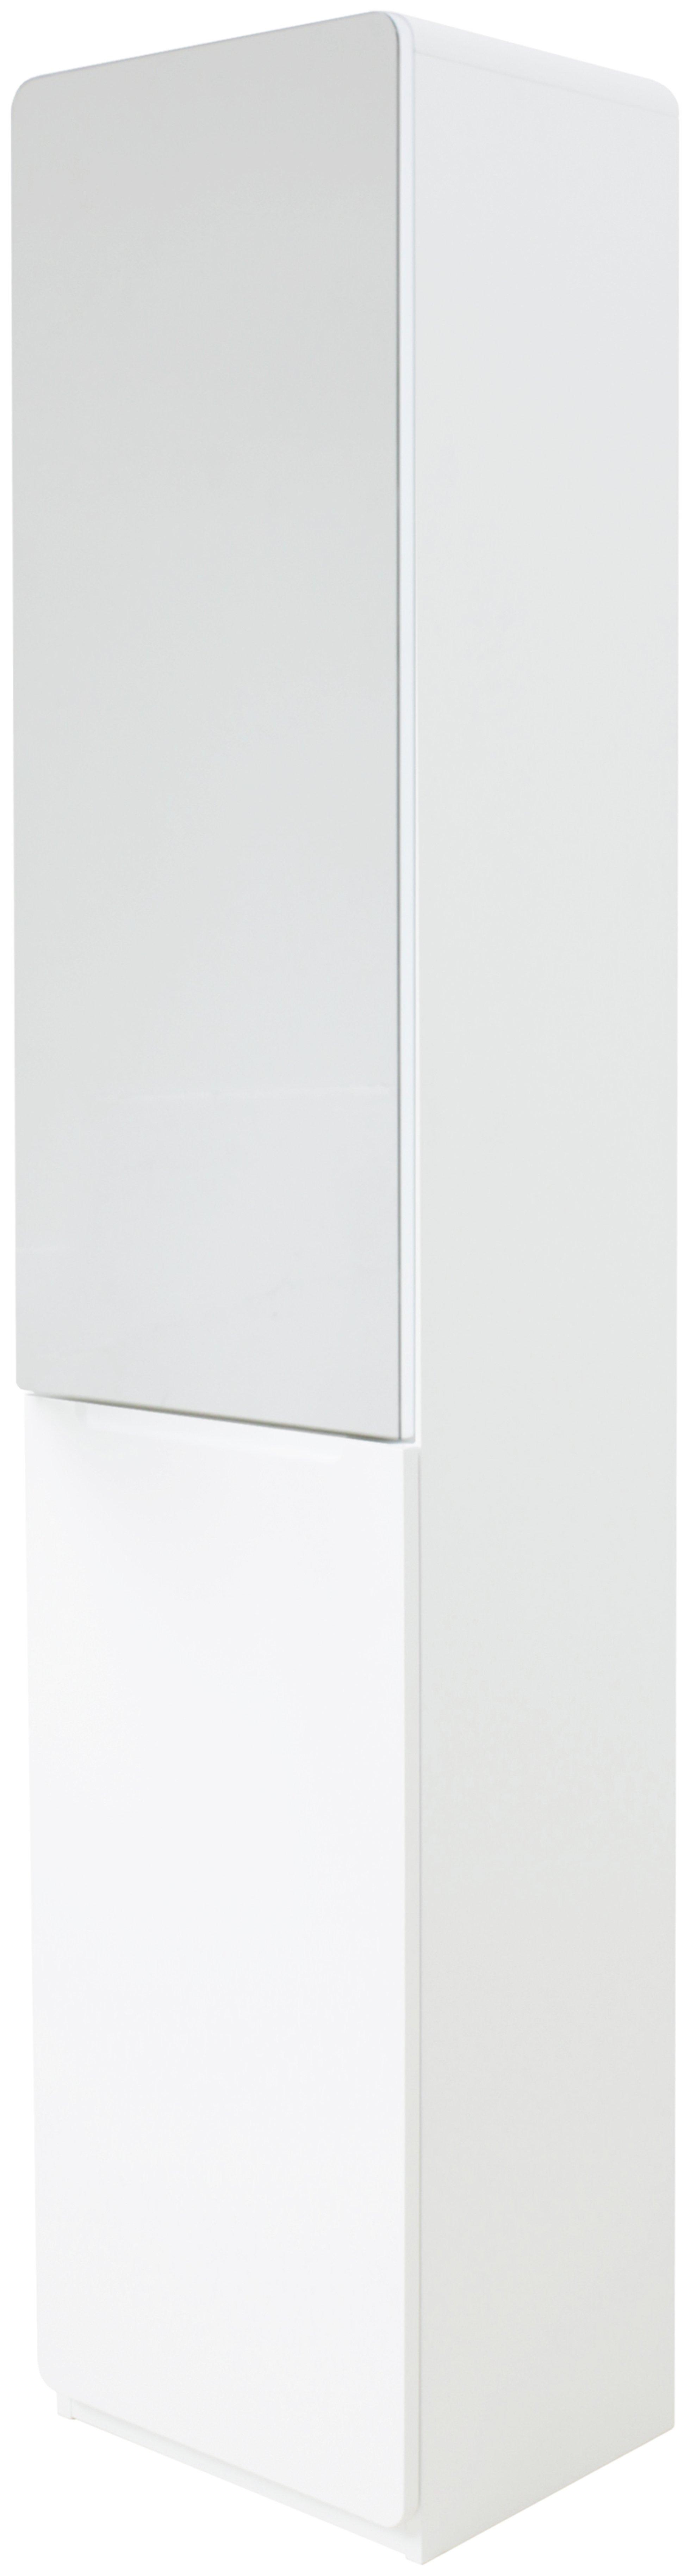 Hygena Curve Tall Bathroom Cabinet White Mysmallspace for measurements 1959 X 7309